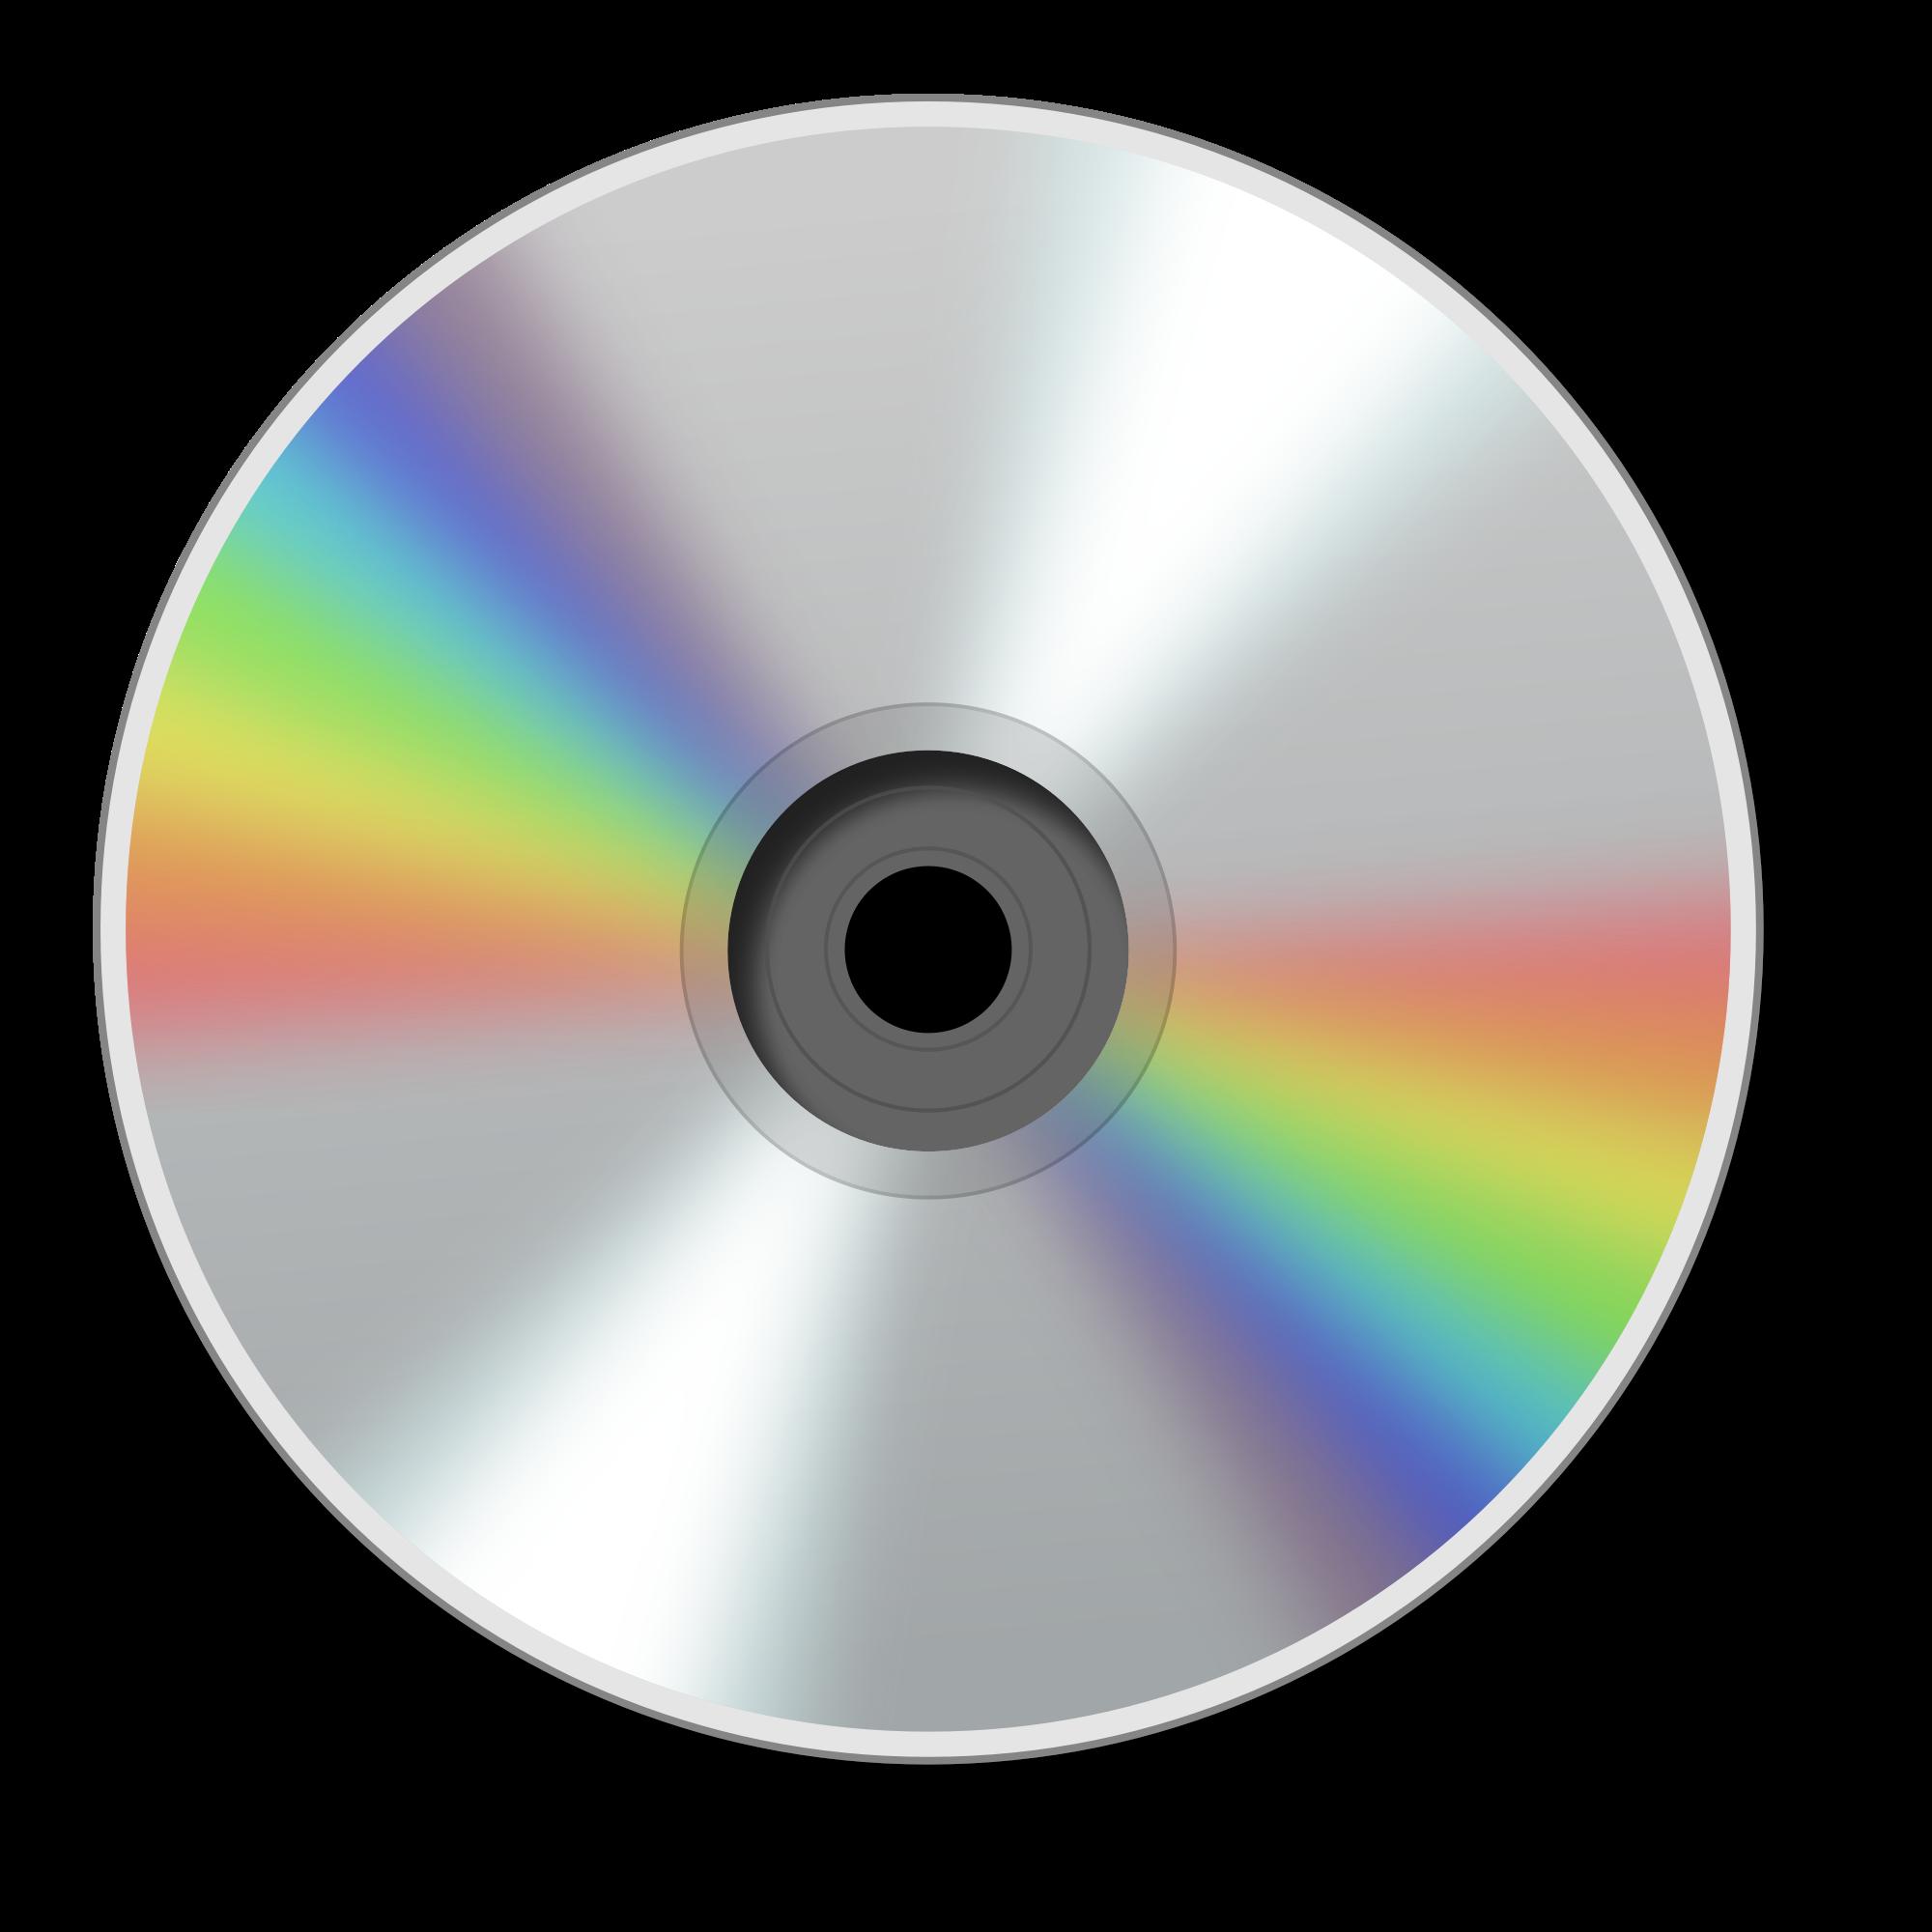 Cd clipart transparent background. Dvd png image